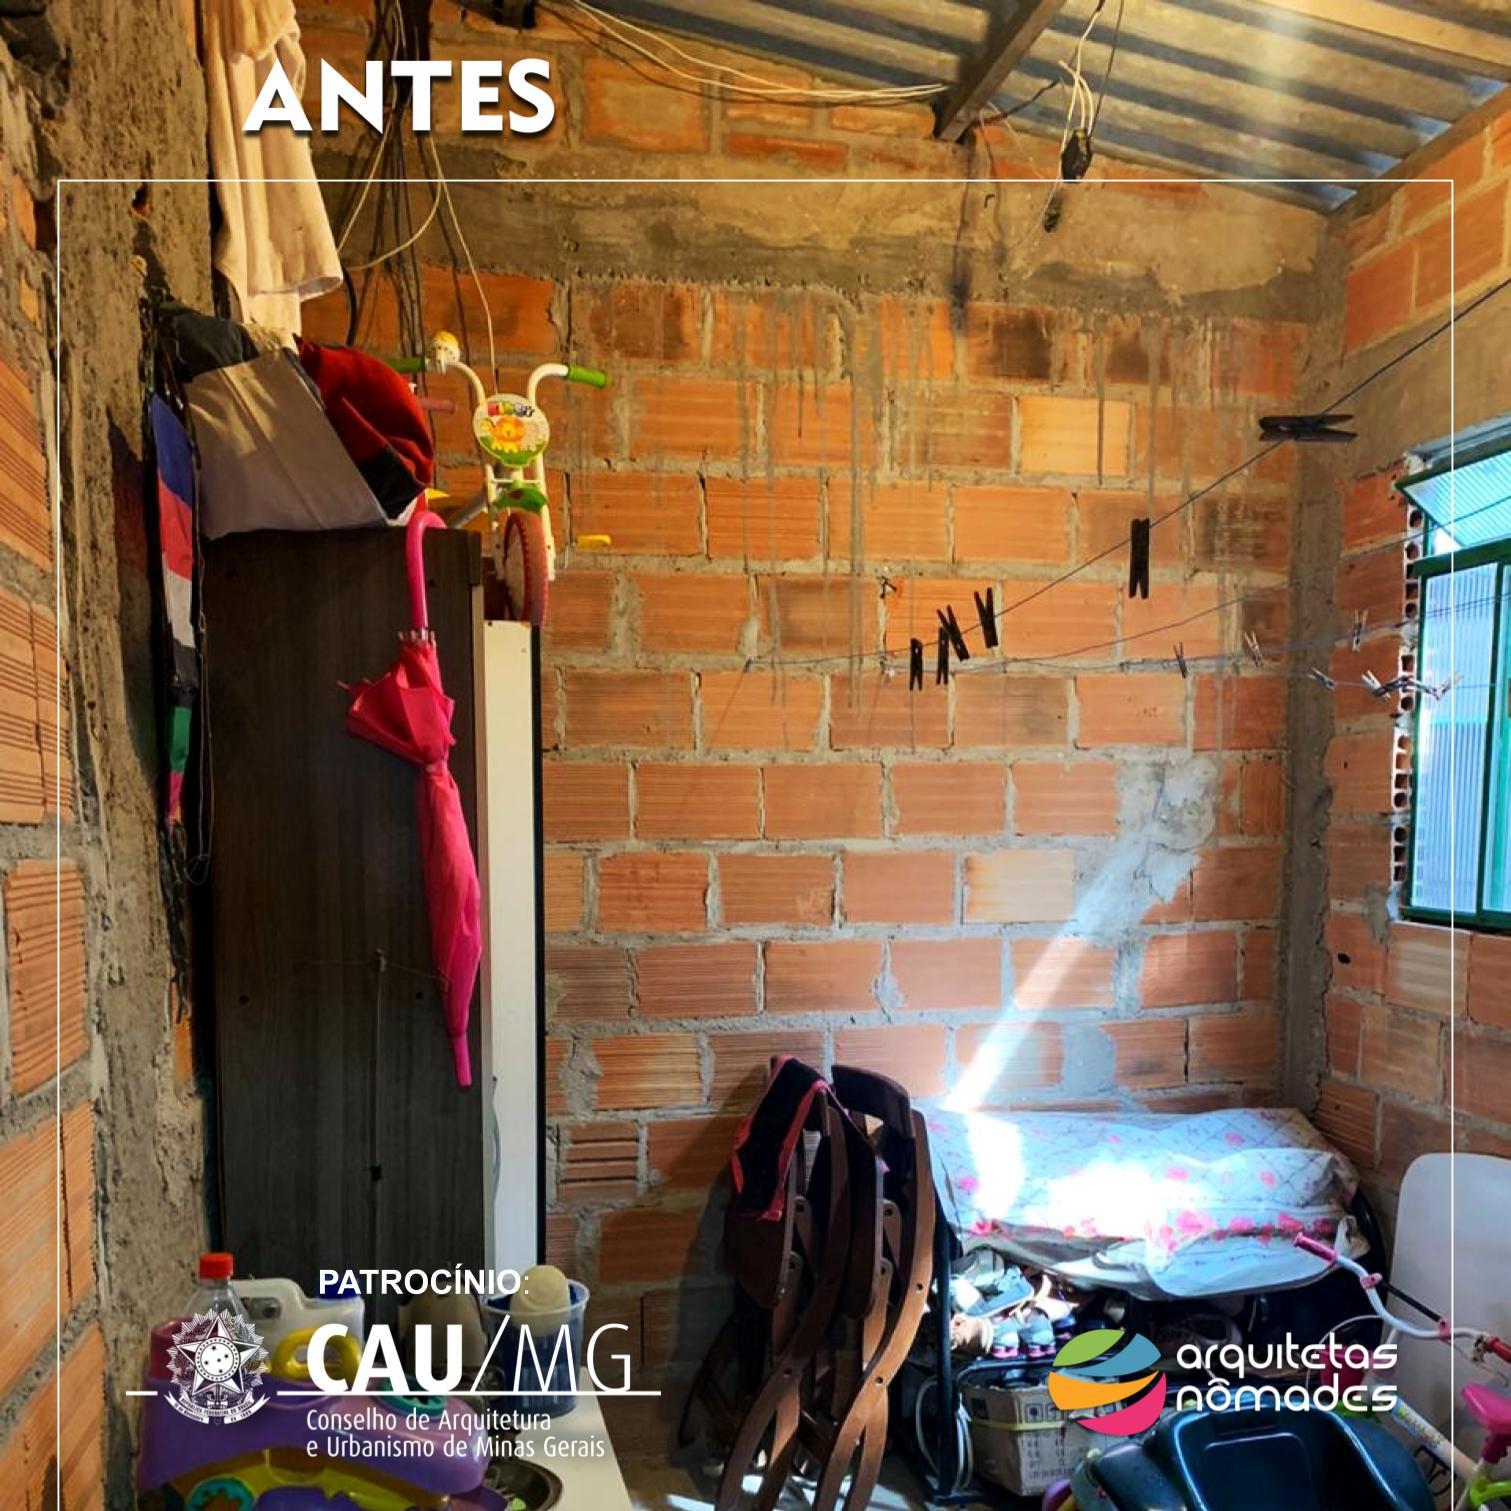 ANTES1 – jeicman